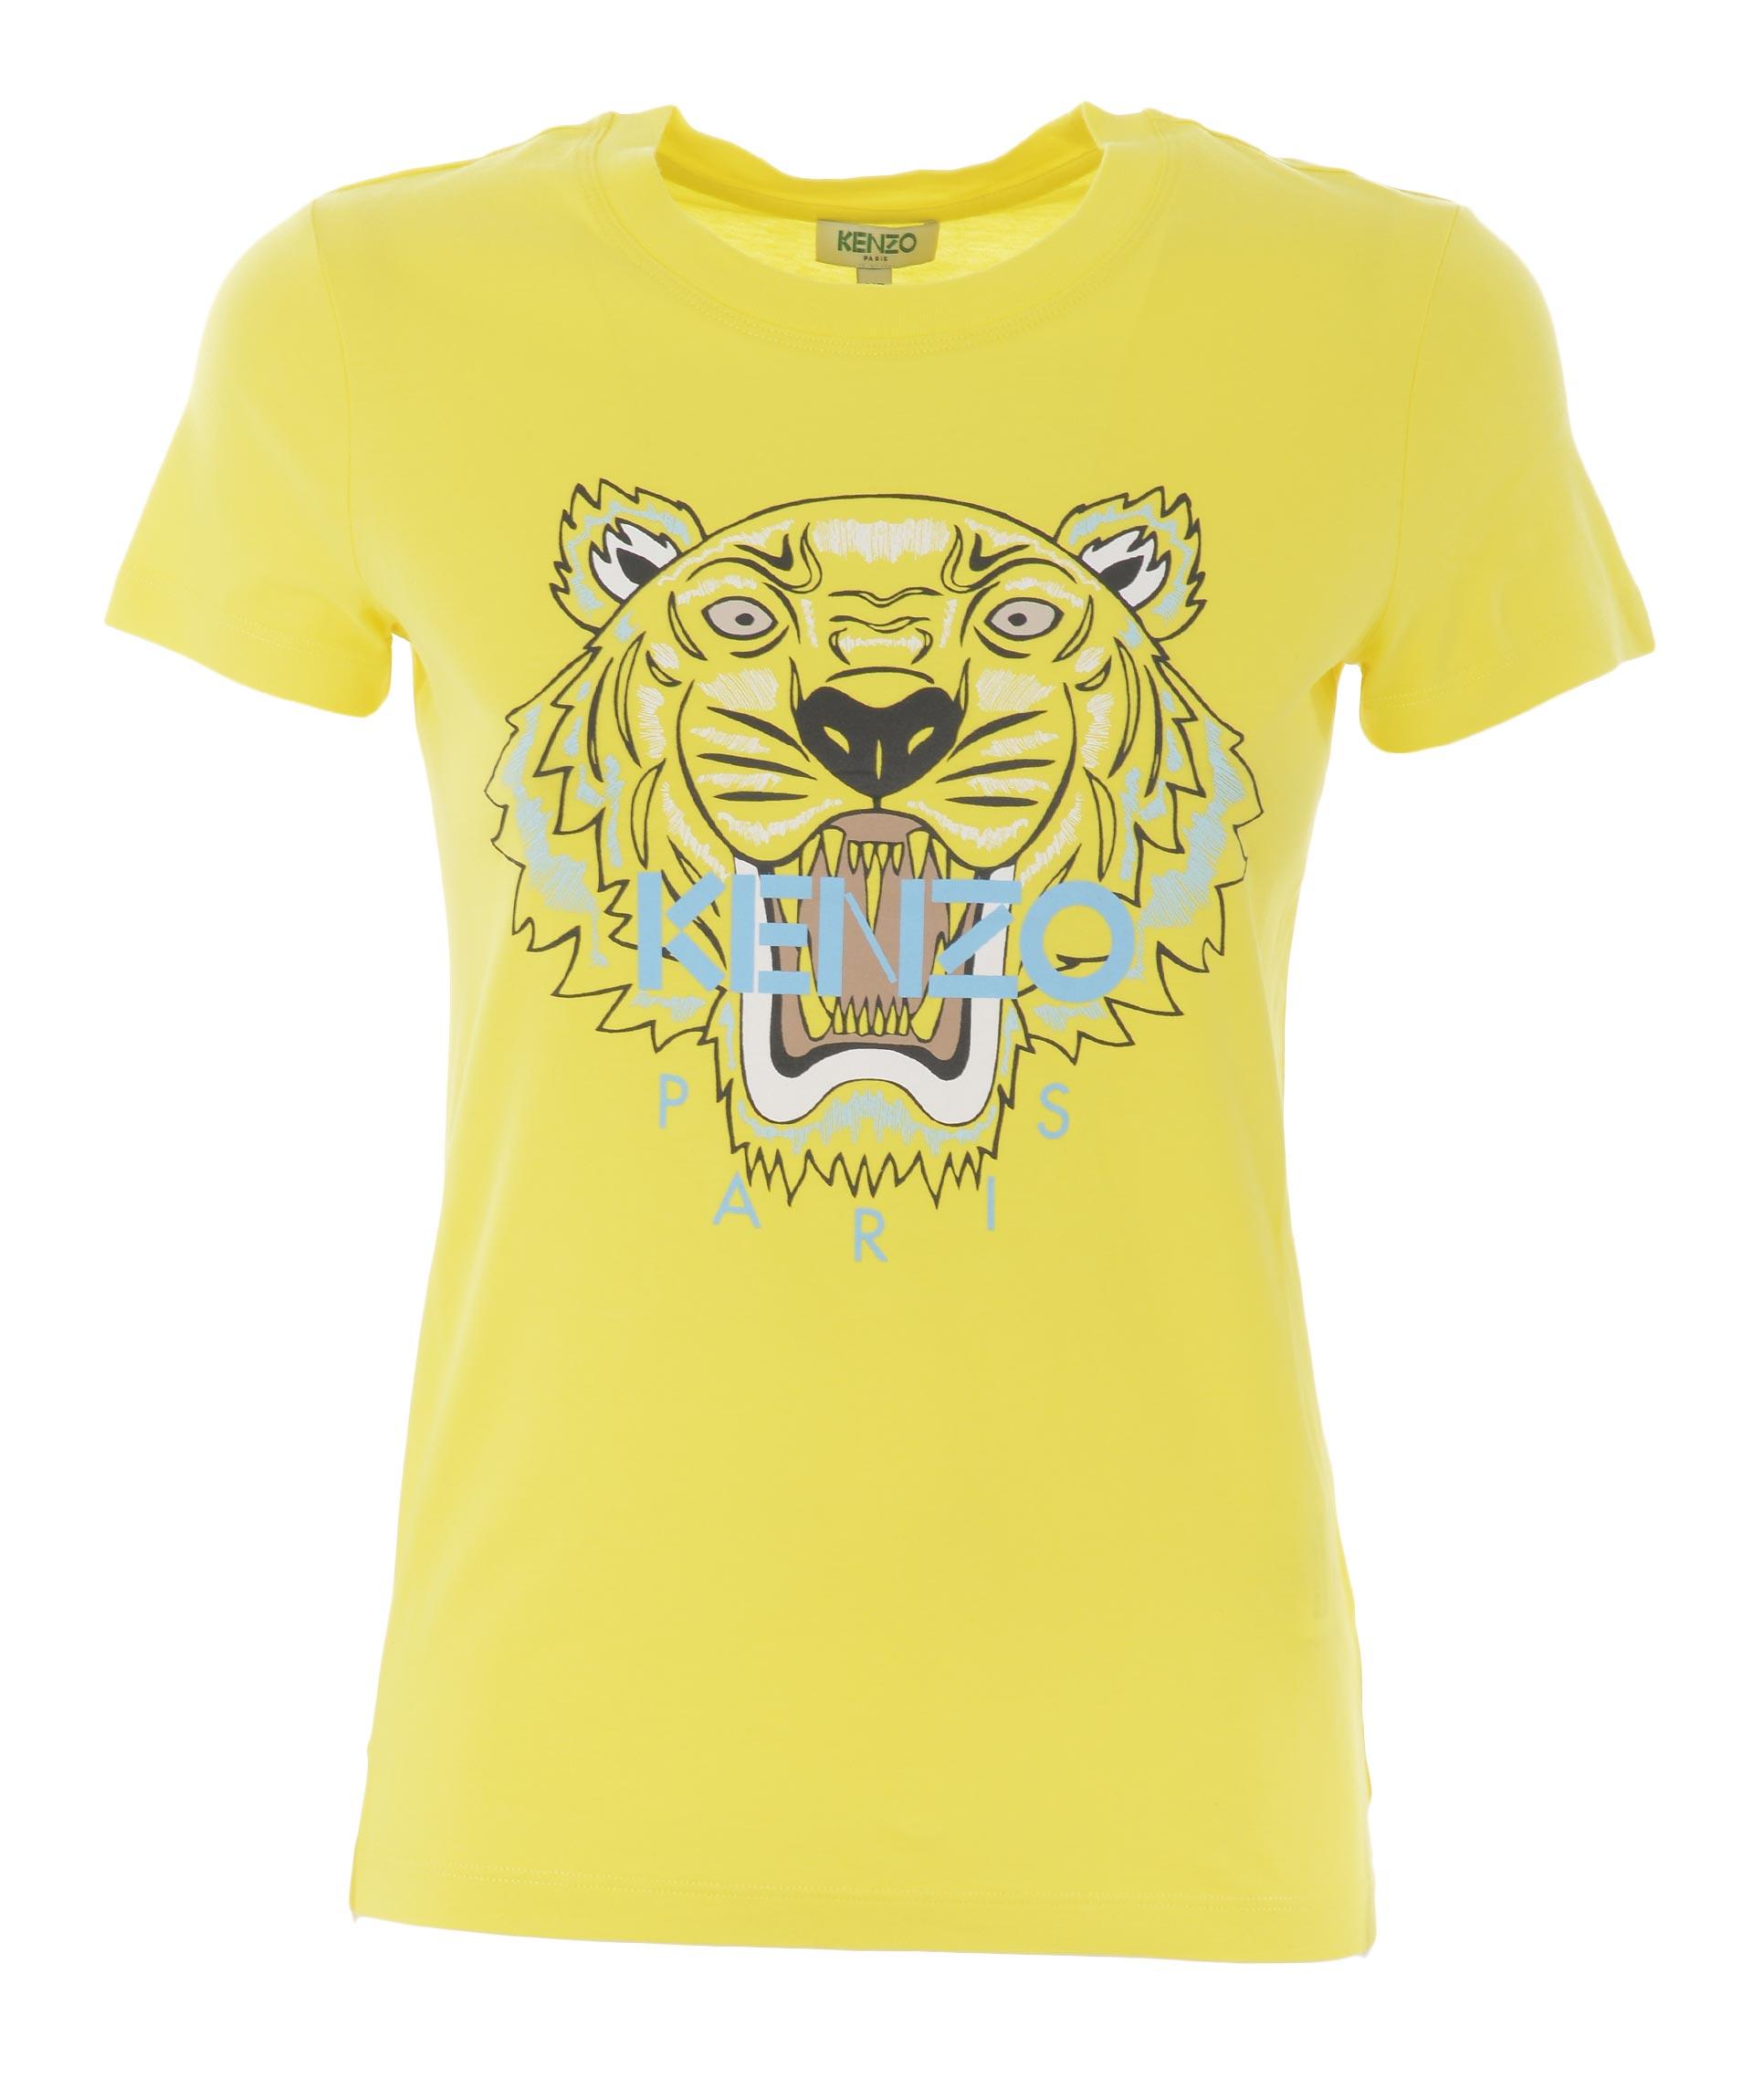 6fa22ca87 T-shirt Kenzo - KENZO - TufanoModa